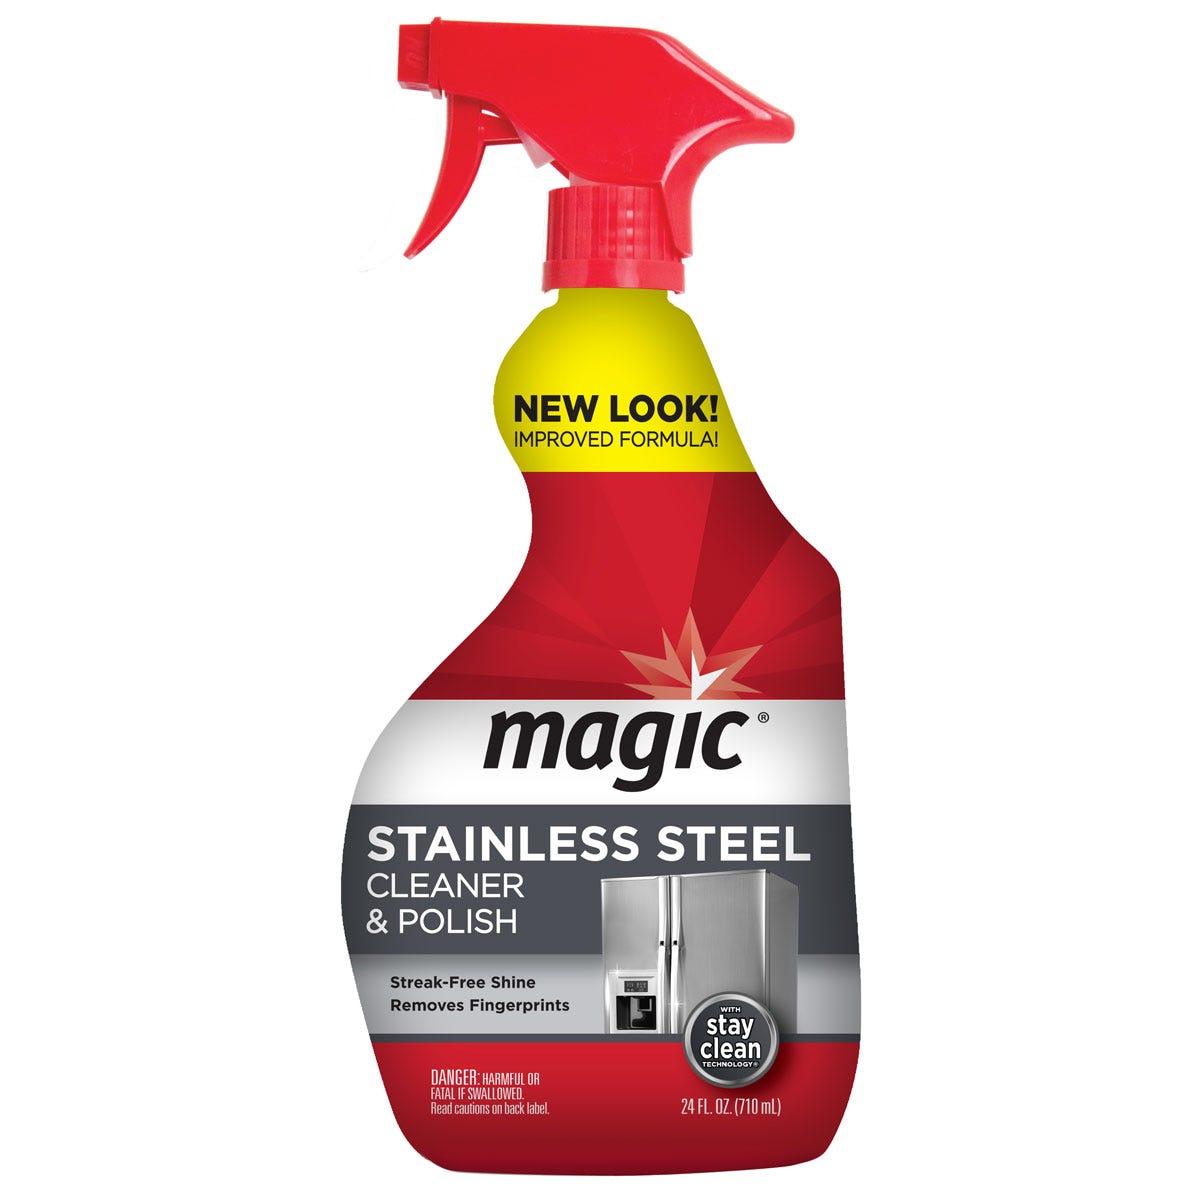 https://googone.com/media/catalog/product/m/a/magic-stainless-steel-cleaner-spray_front.jpg